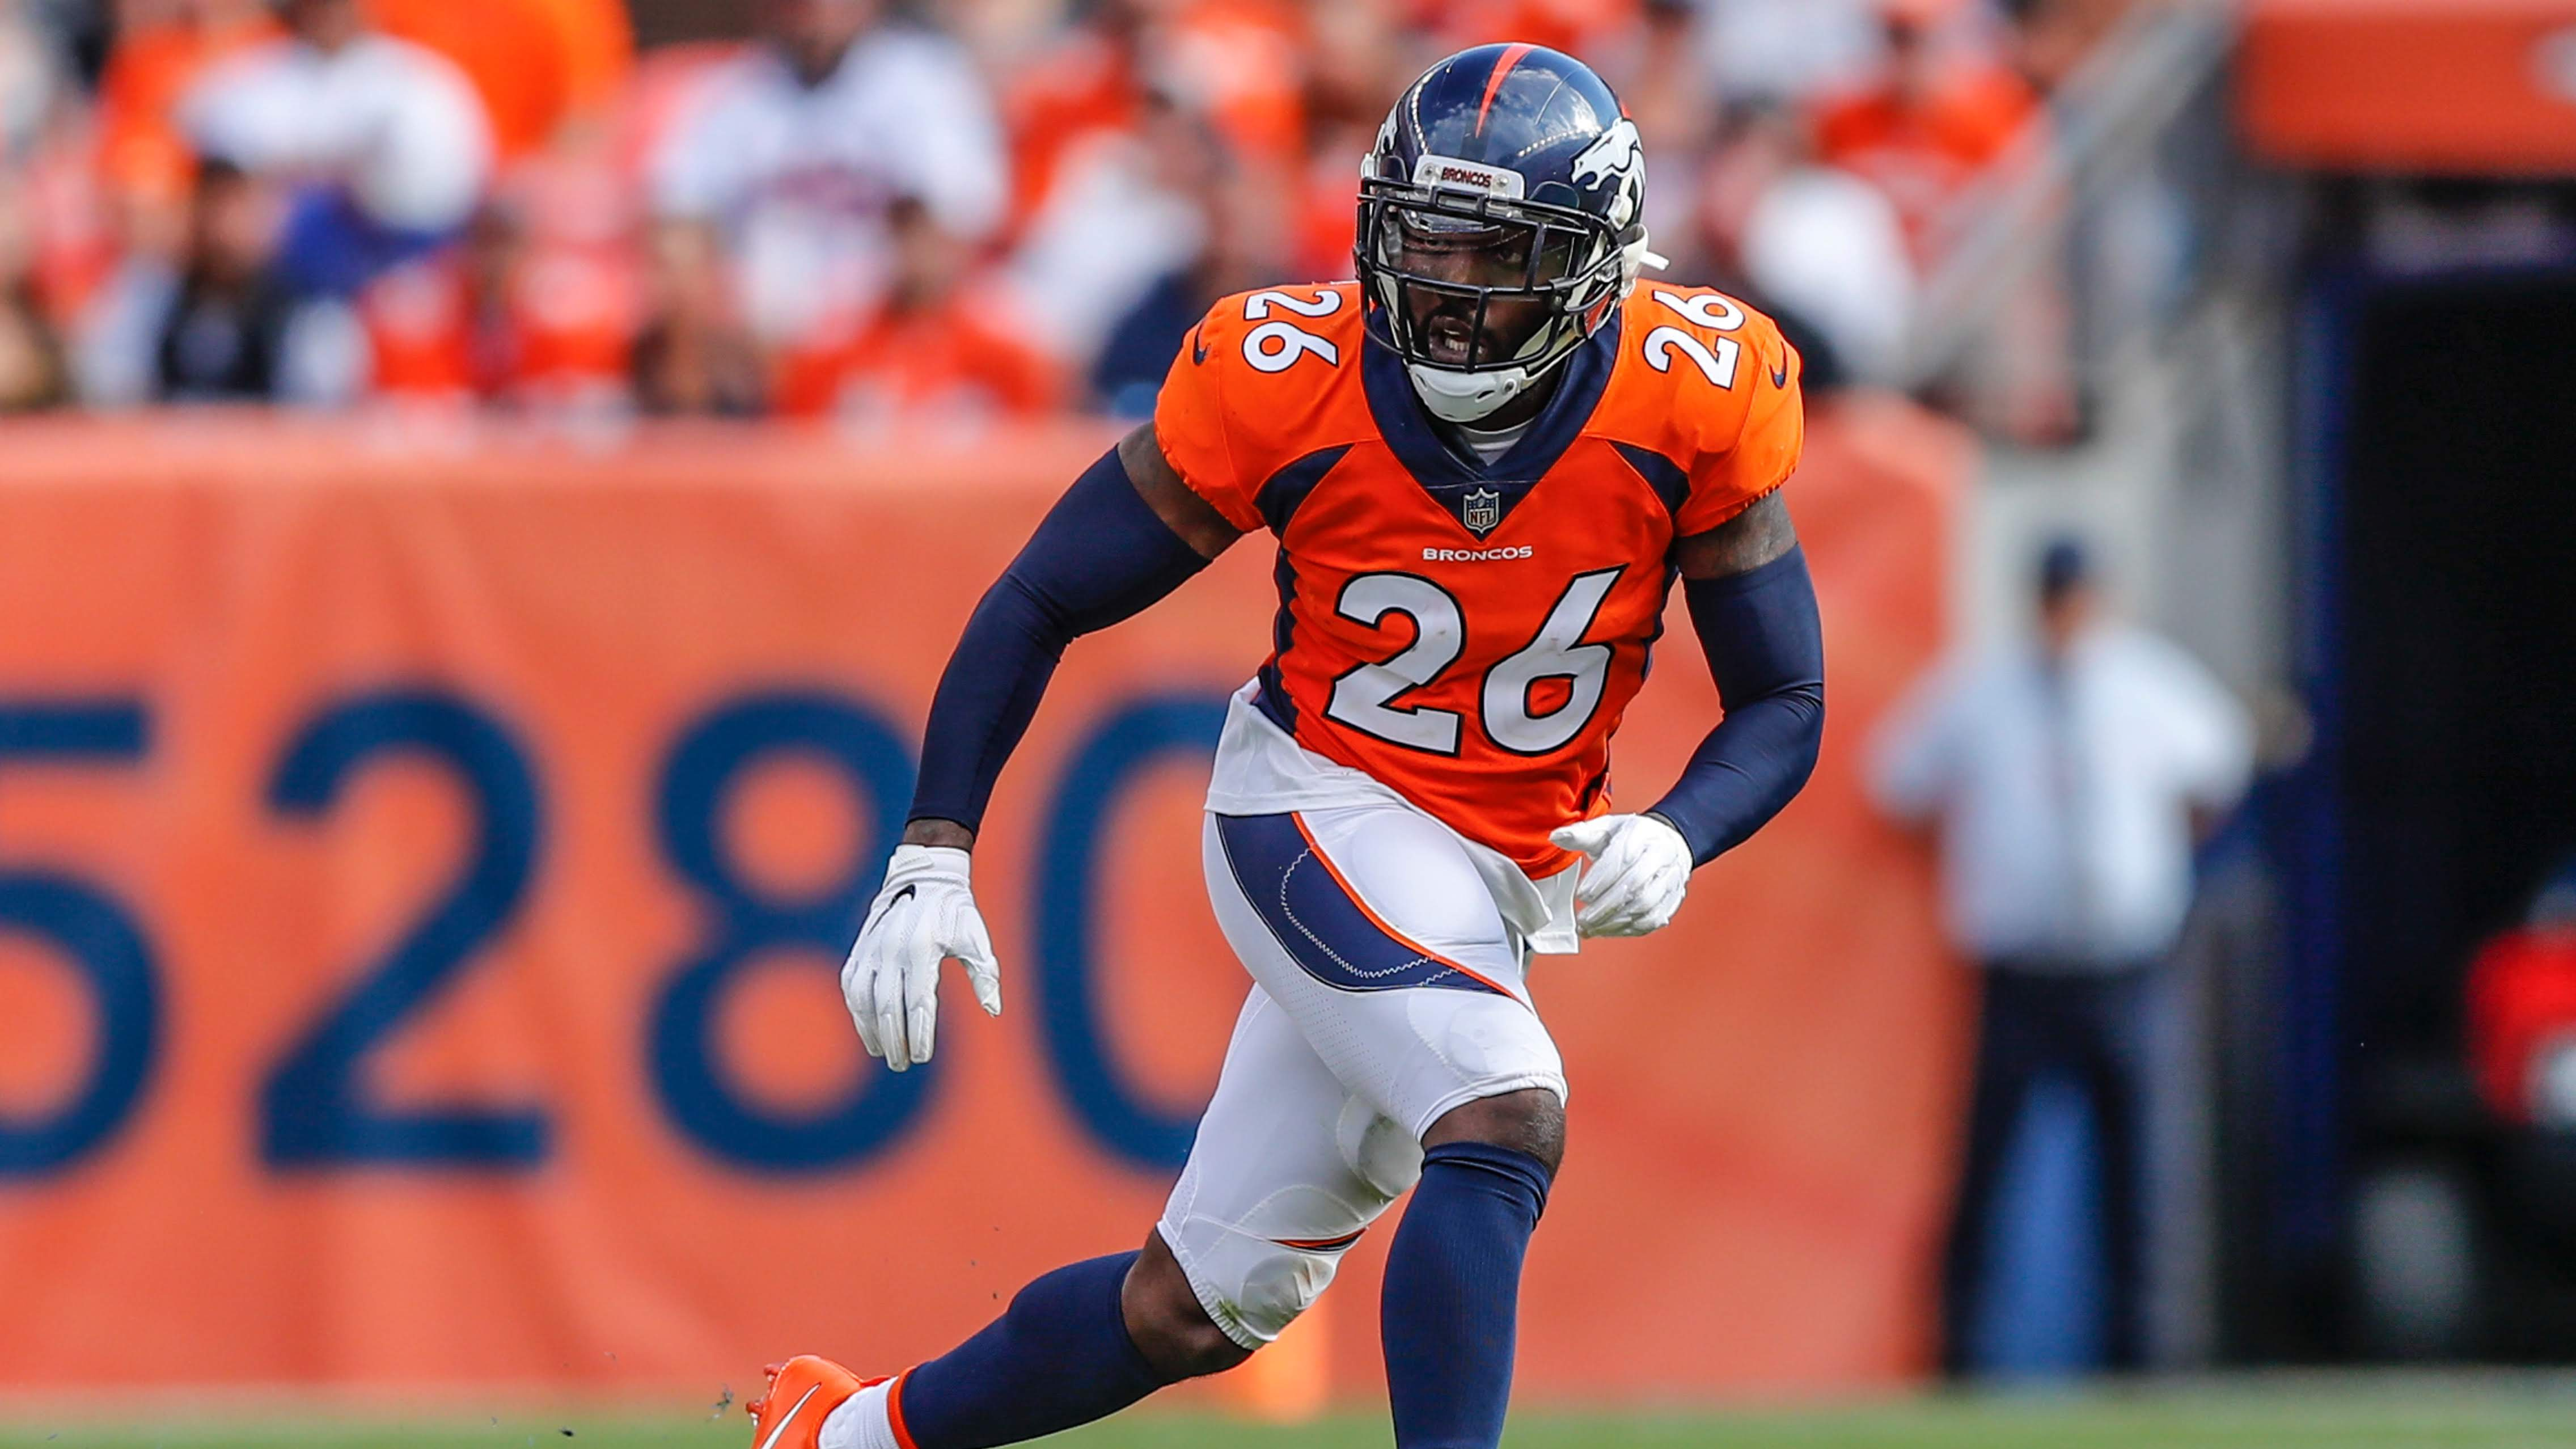 Former Broncos safety Darian Stewart brings veteran experience to Bucs